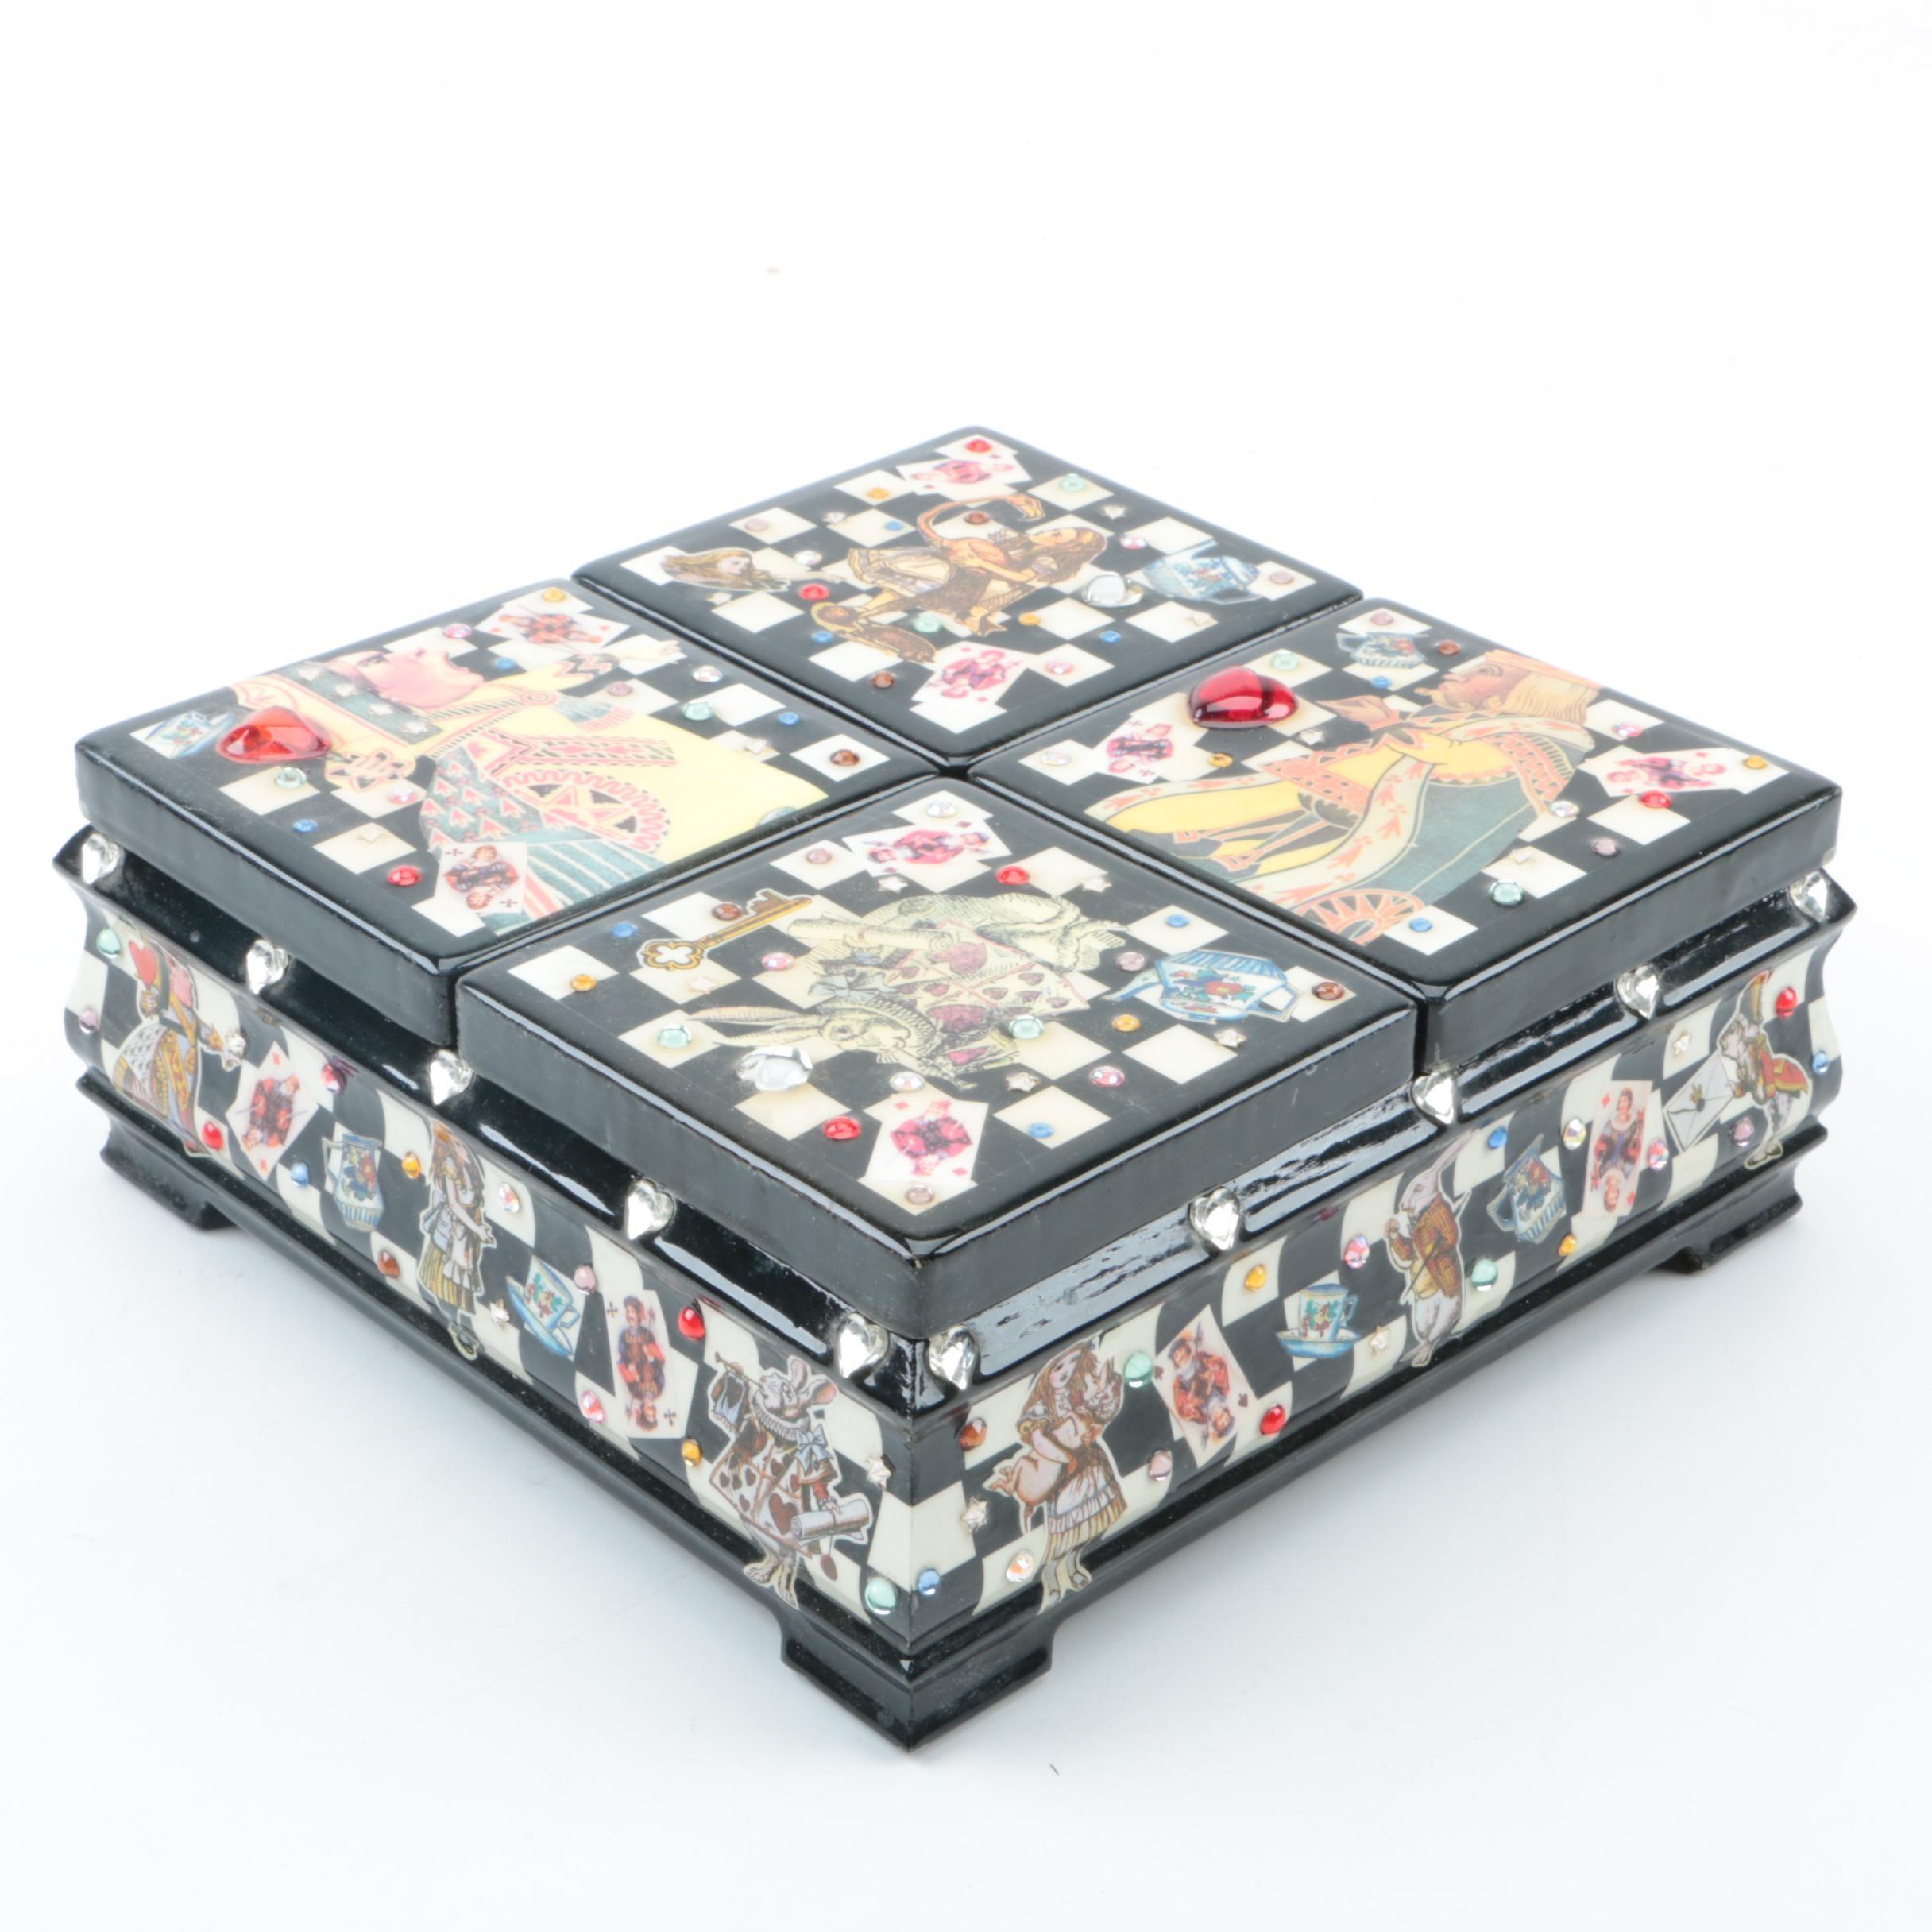 """Alice in Wonderland"" Themed Ceramic Jewelry Box"